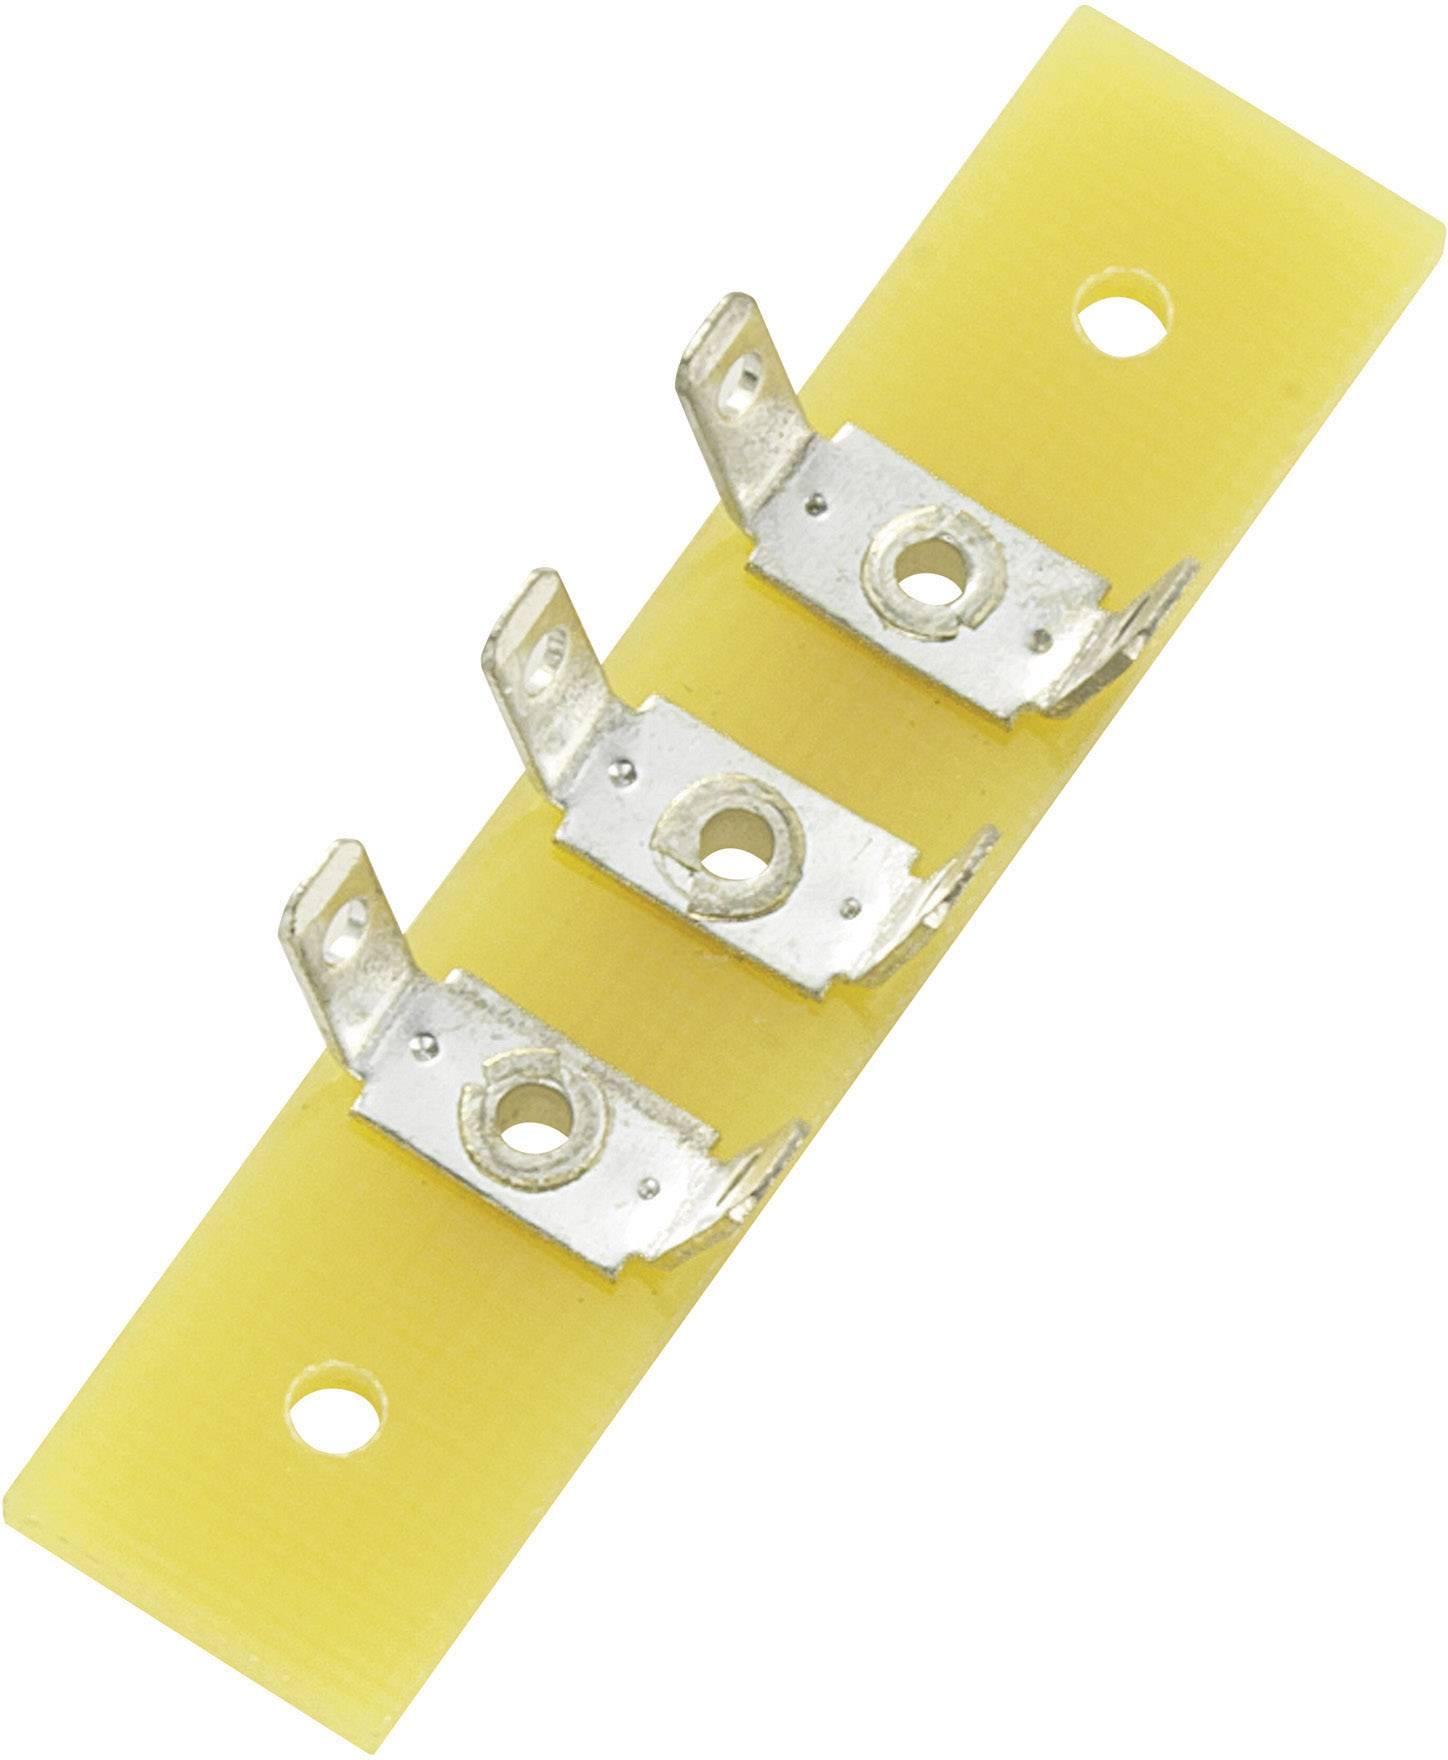 Spájkovacia lišta Conrad Components 530626, pólov 3, (d x š x v) 44 x 10 x 1.6 mm, 1 ks